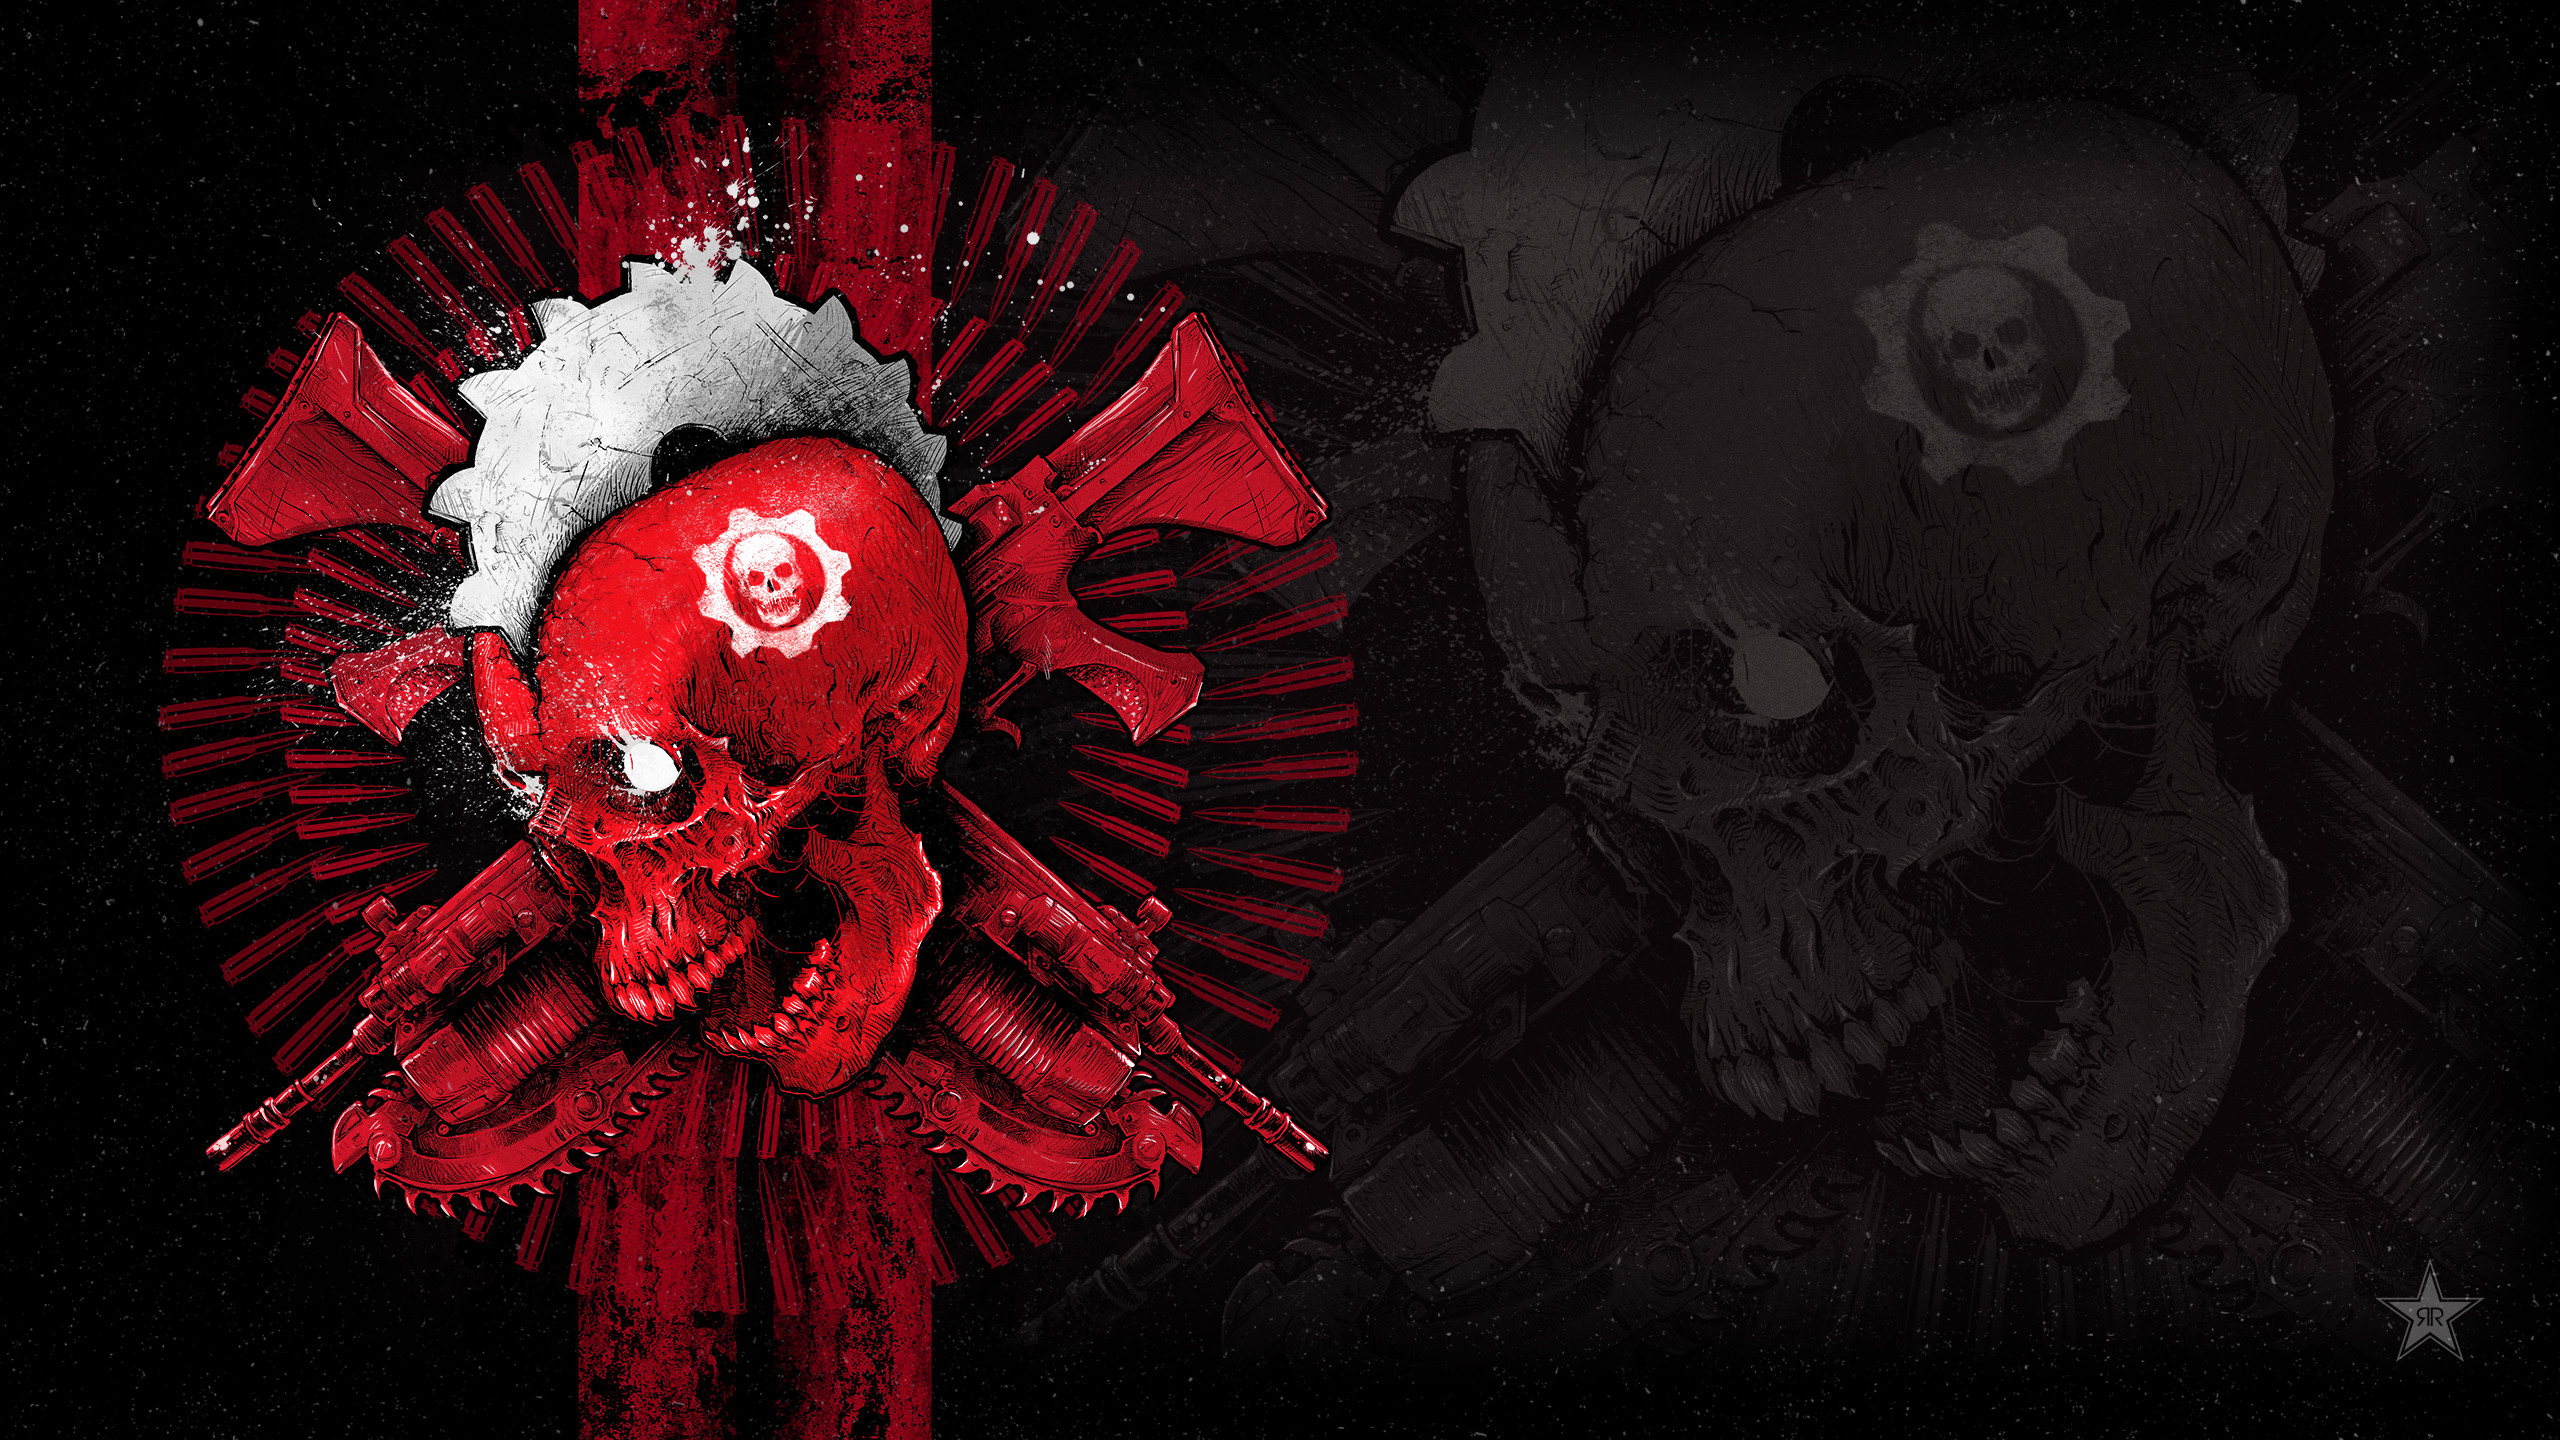 GEARS OF WAR 4 GODMACHINE Game Wallpaper HD